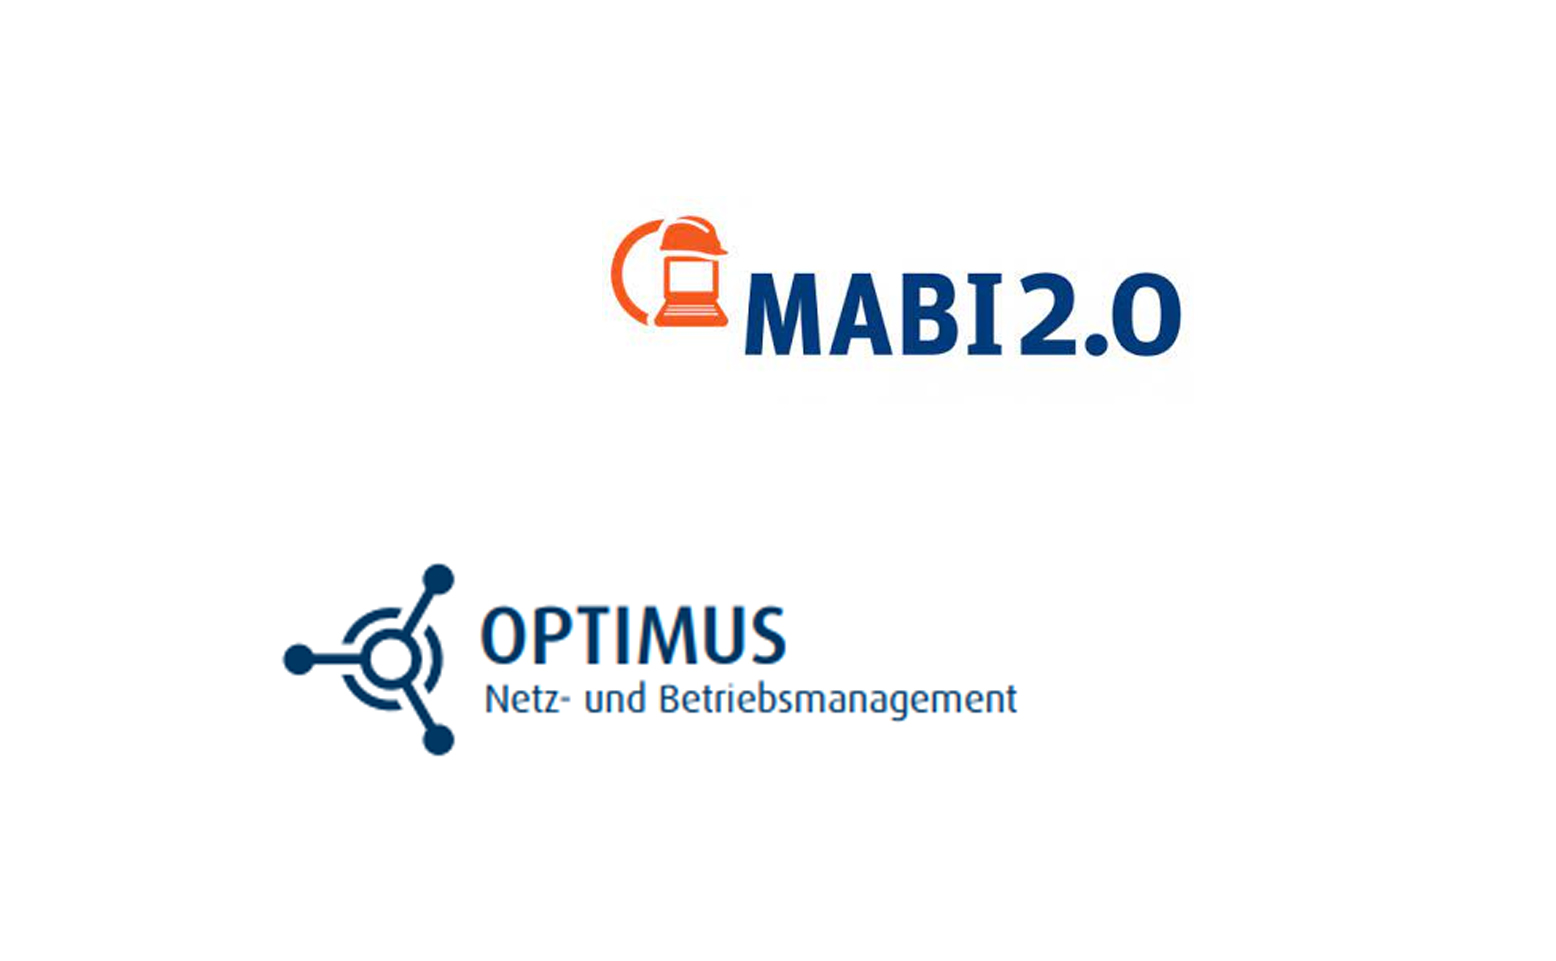 OPTIMUS und MABI